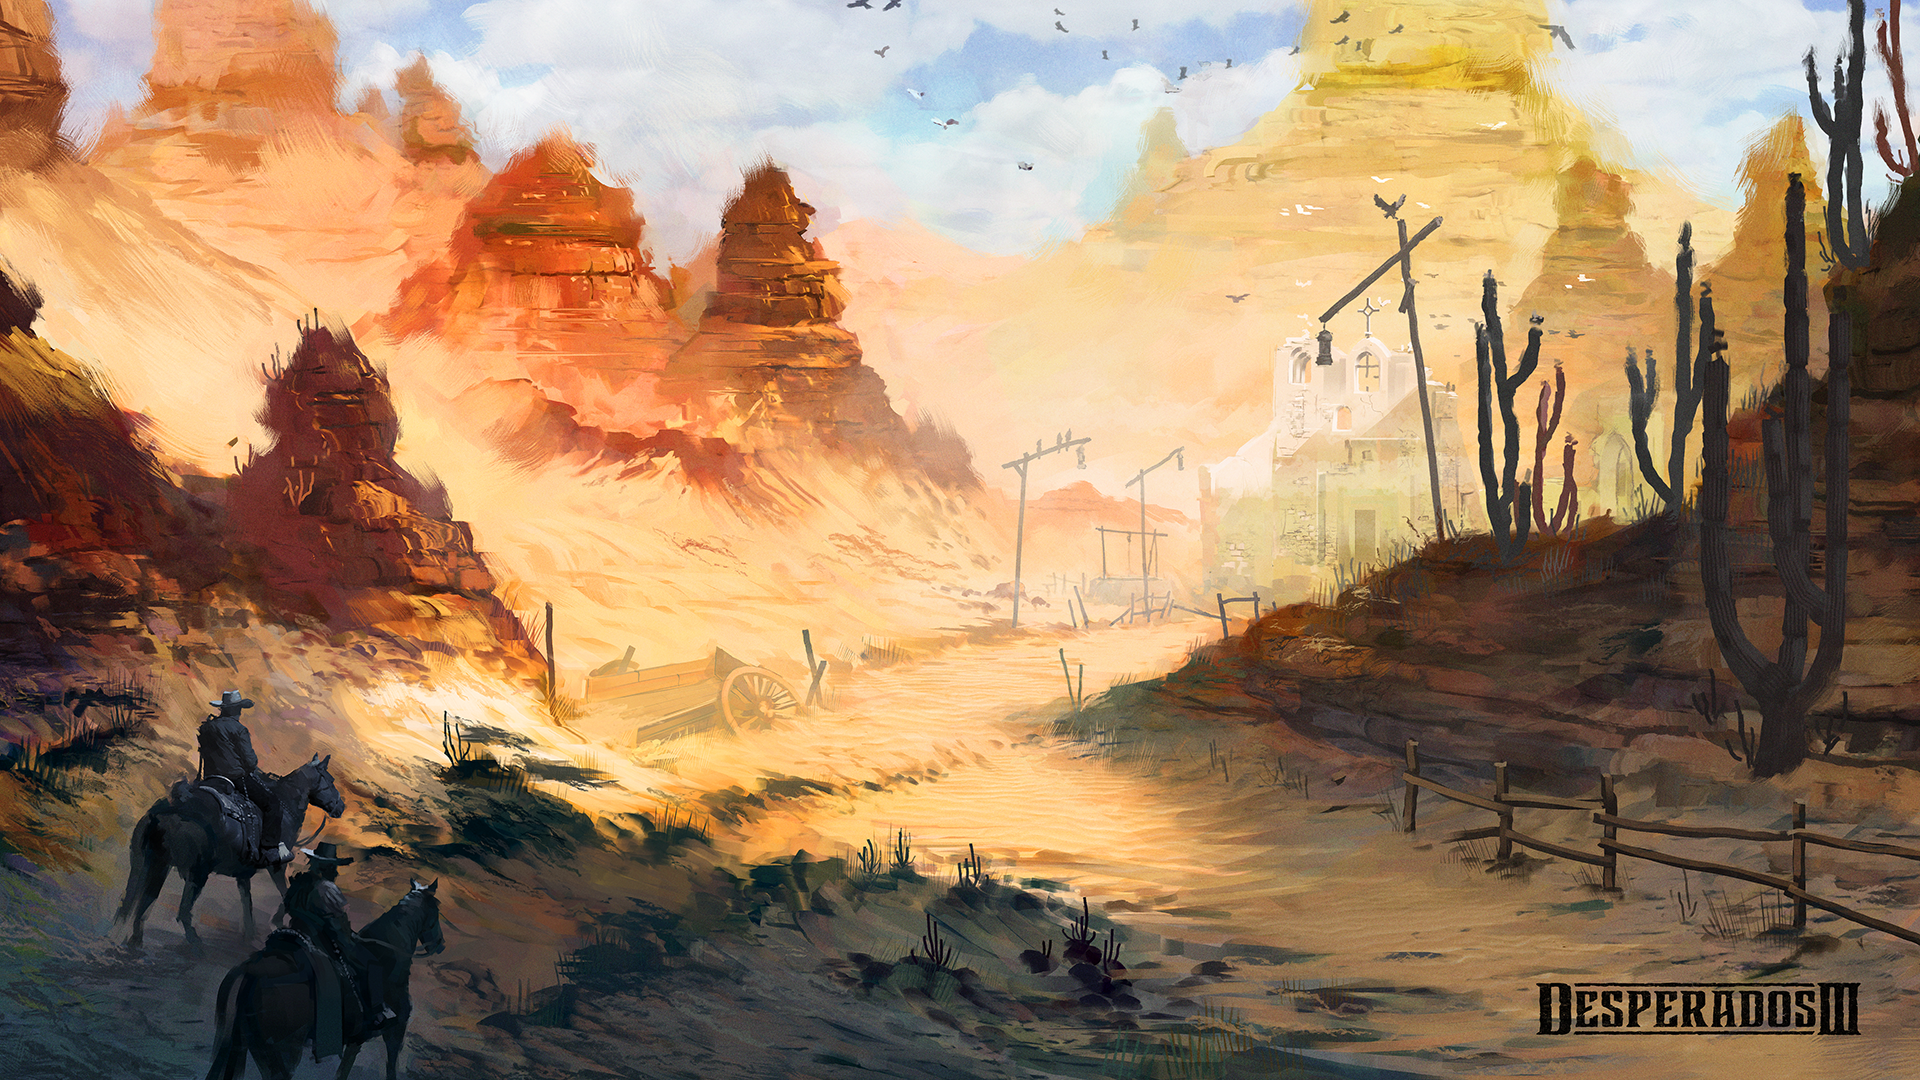 Desperados 3 Ruins Mood Concept By Lucas Reiner On Deviantart